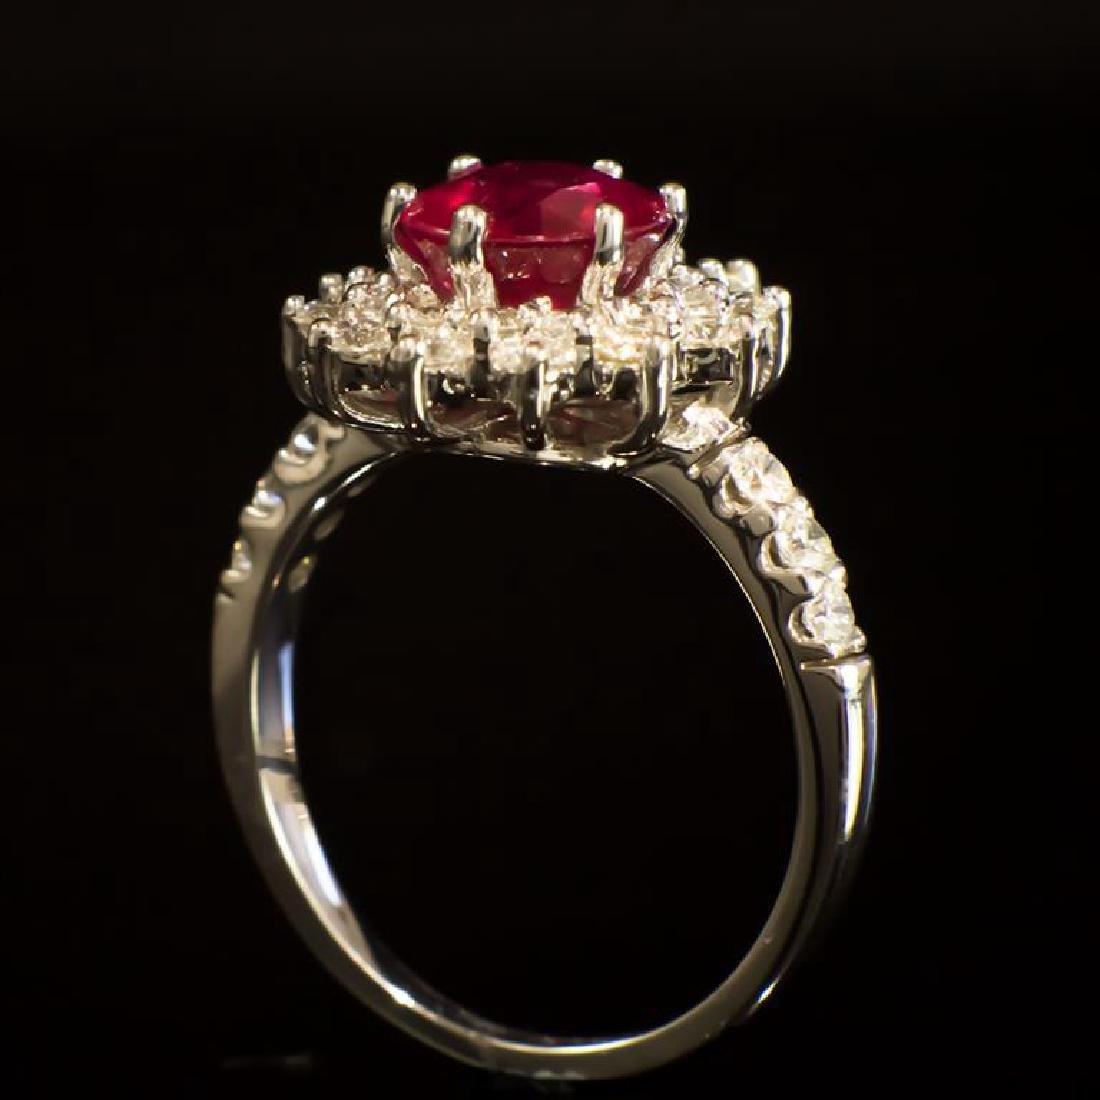 14K Gold 2.34ct Ruby 1.20ct Diamond Ring - 3